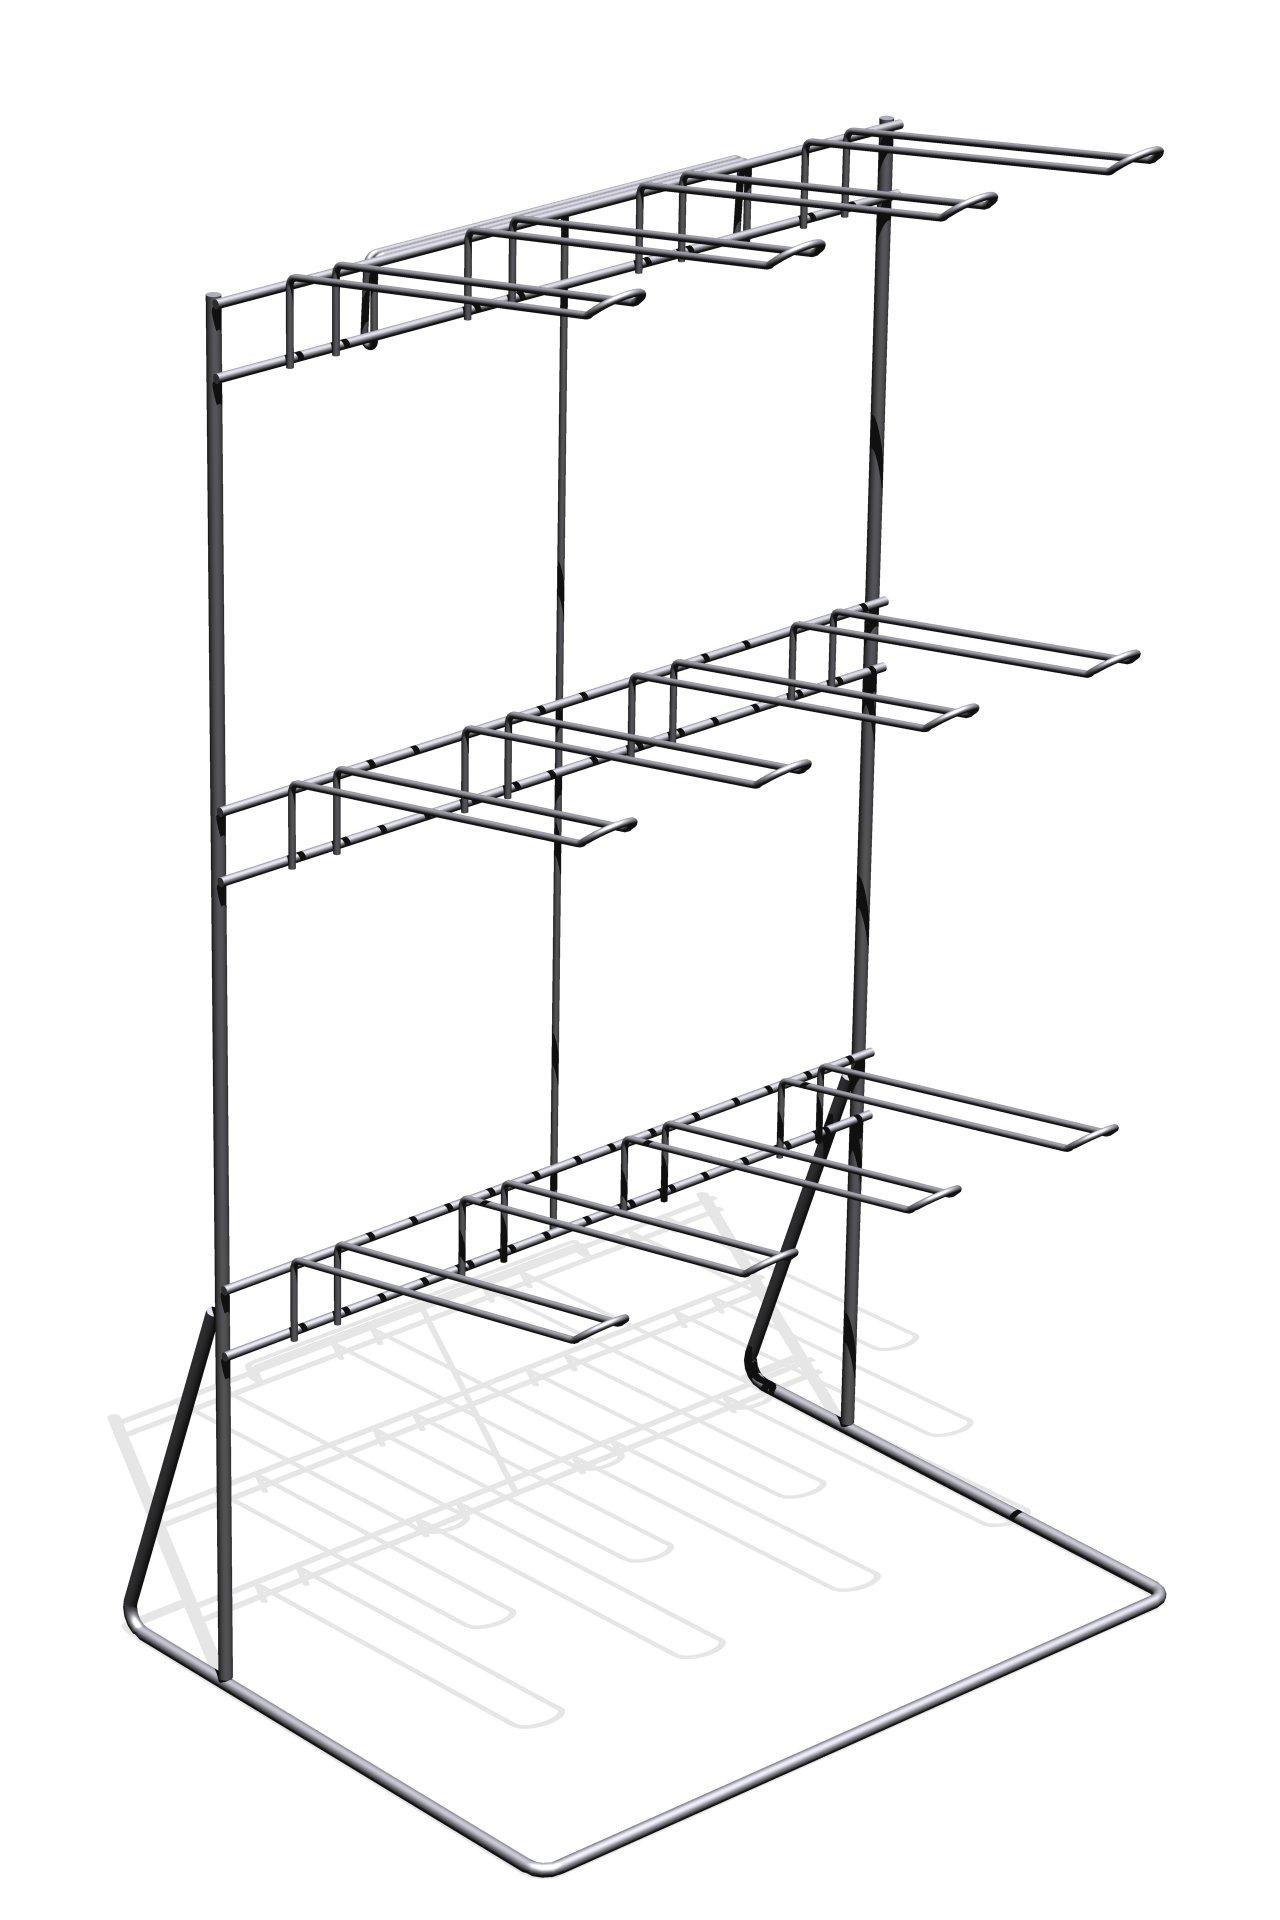 deg 802 06 60 buyck displays. Black Bedroom Furniture Sets. Home Design Ideas